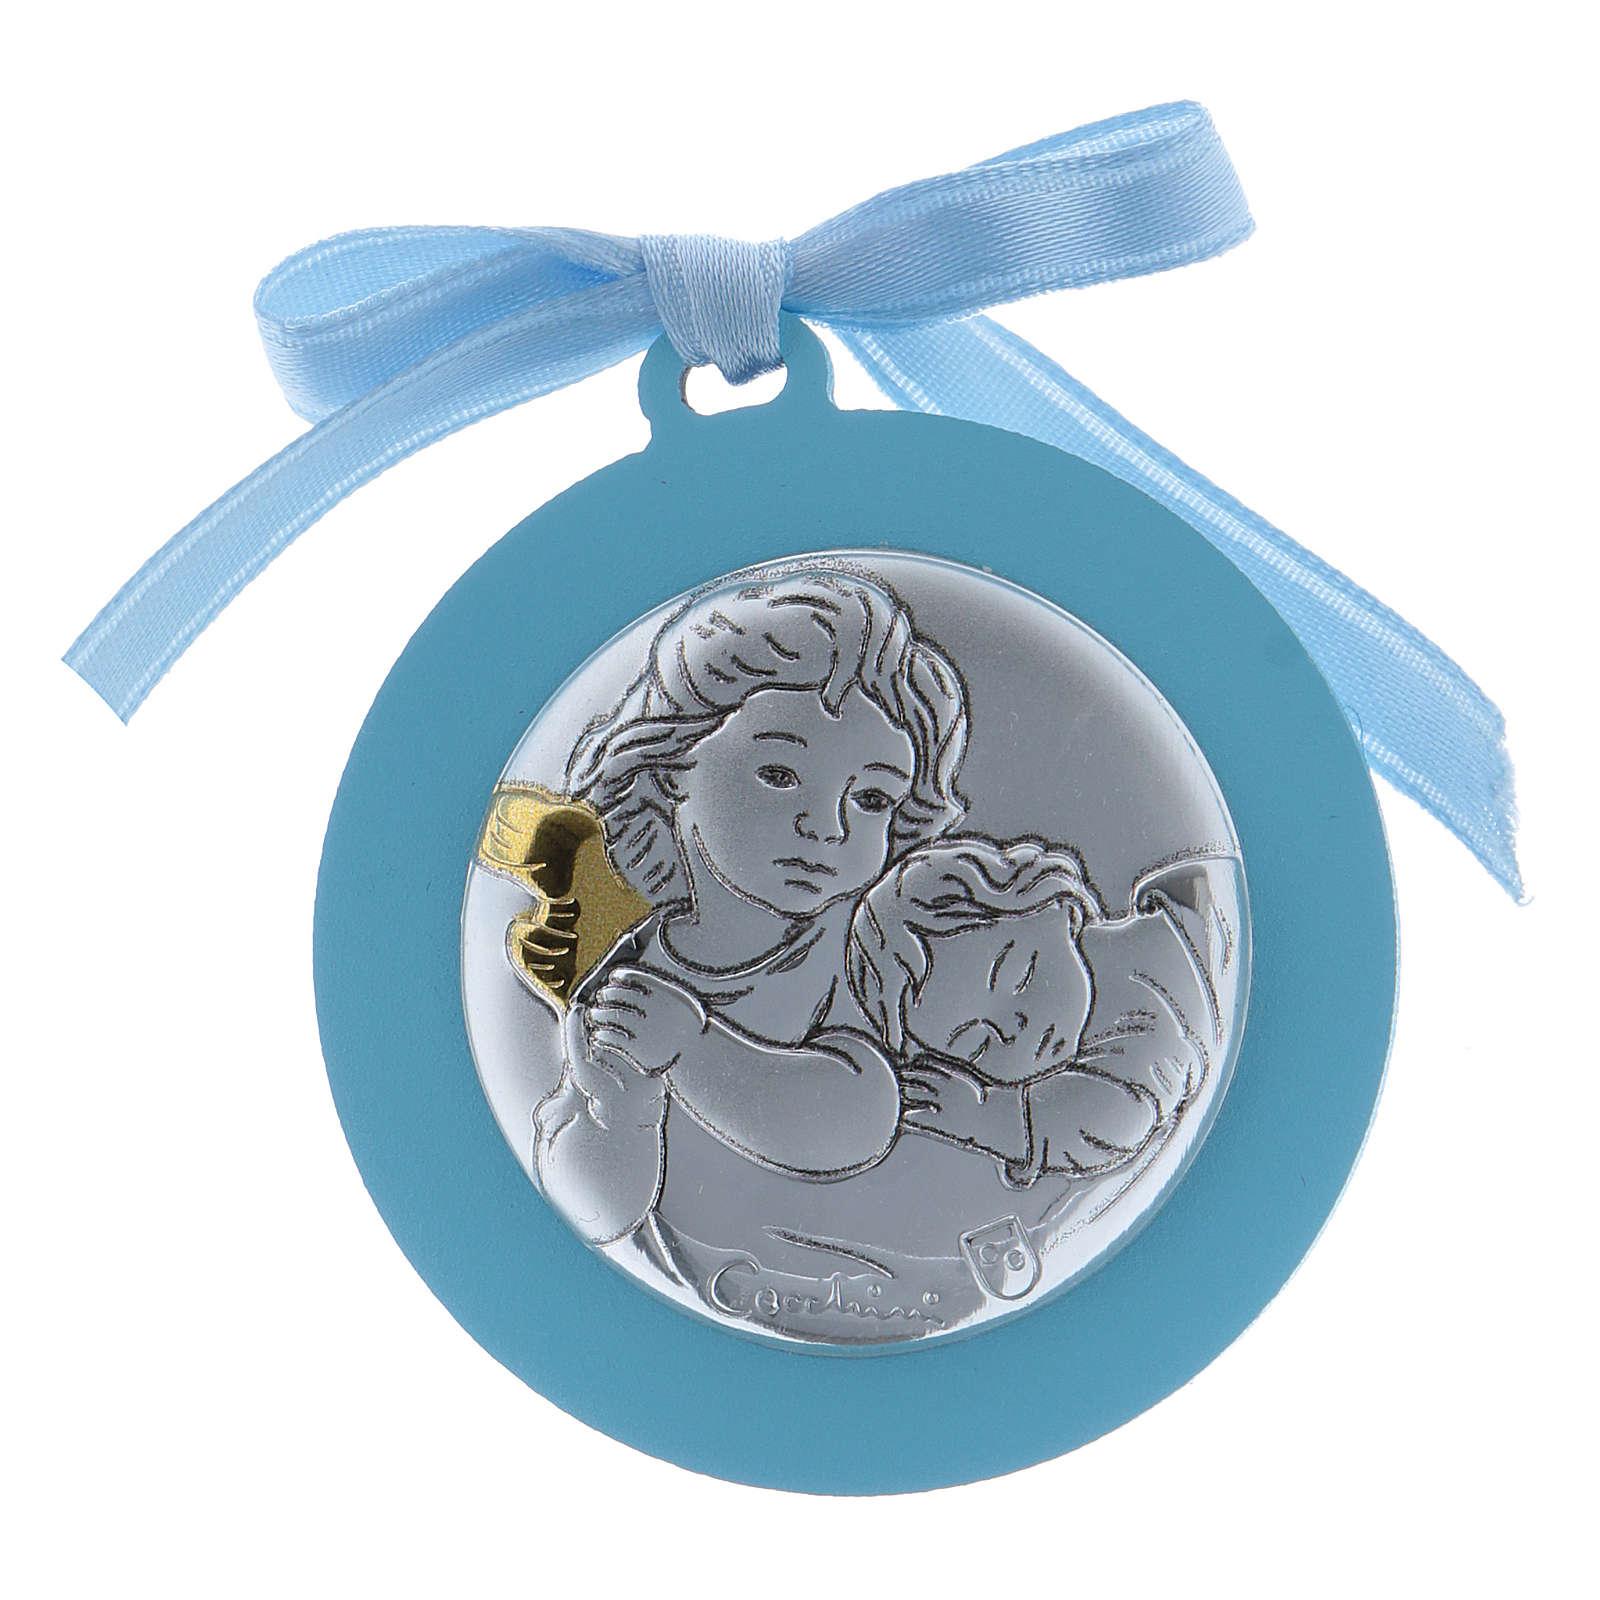 Medalla para cuna Ángeles cinta azul bilaminado detalles oro 4